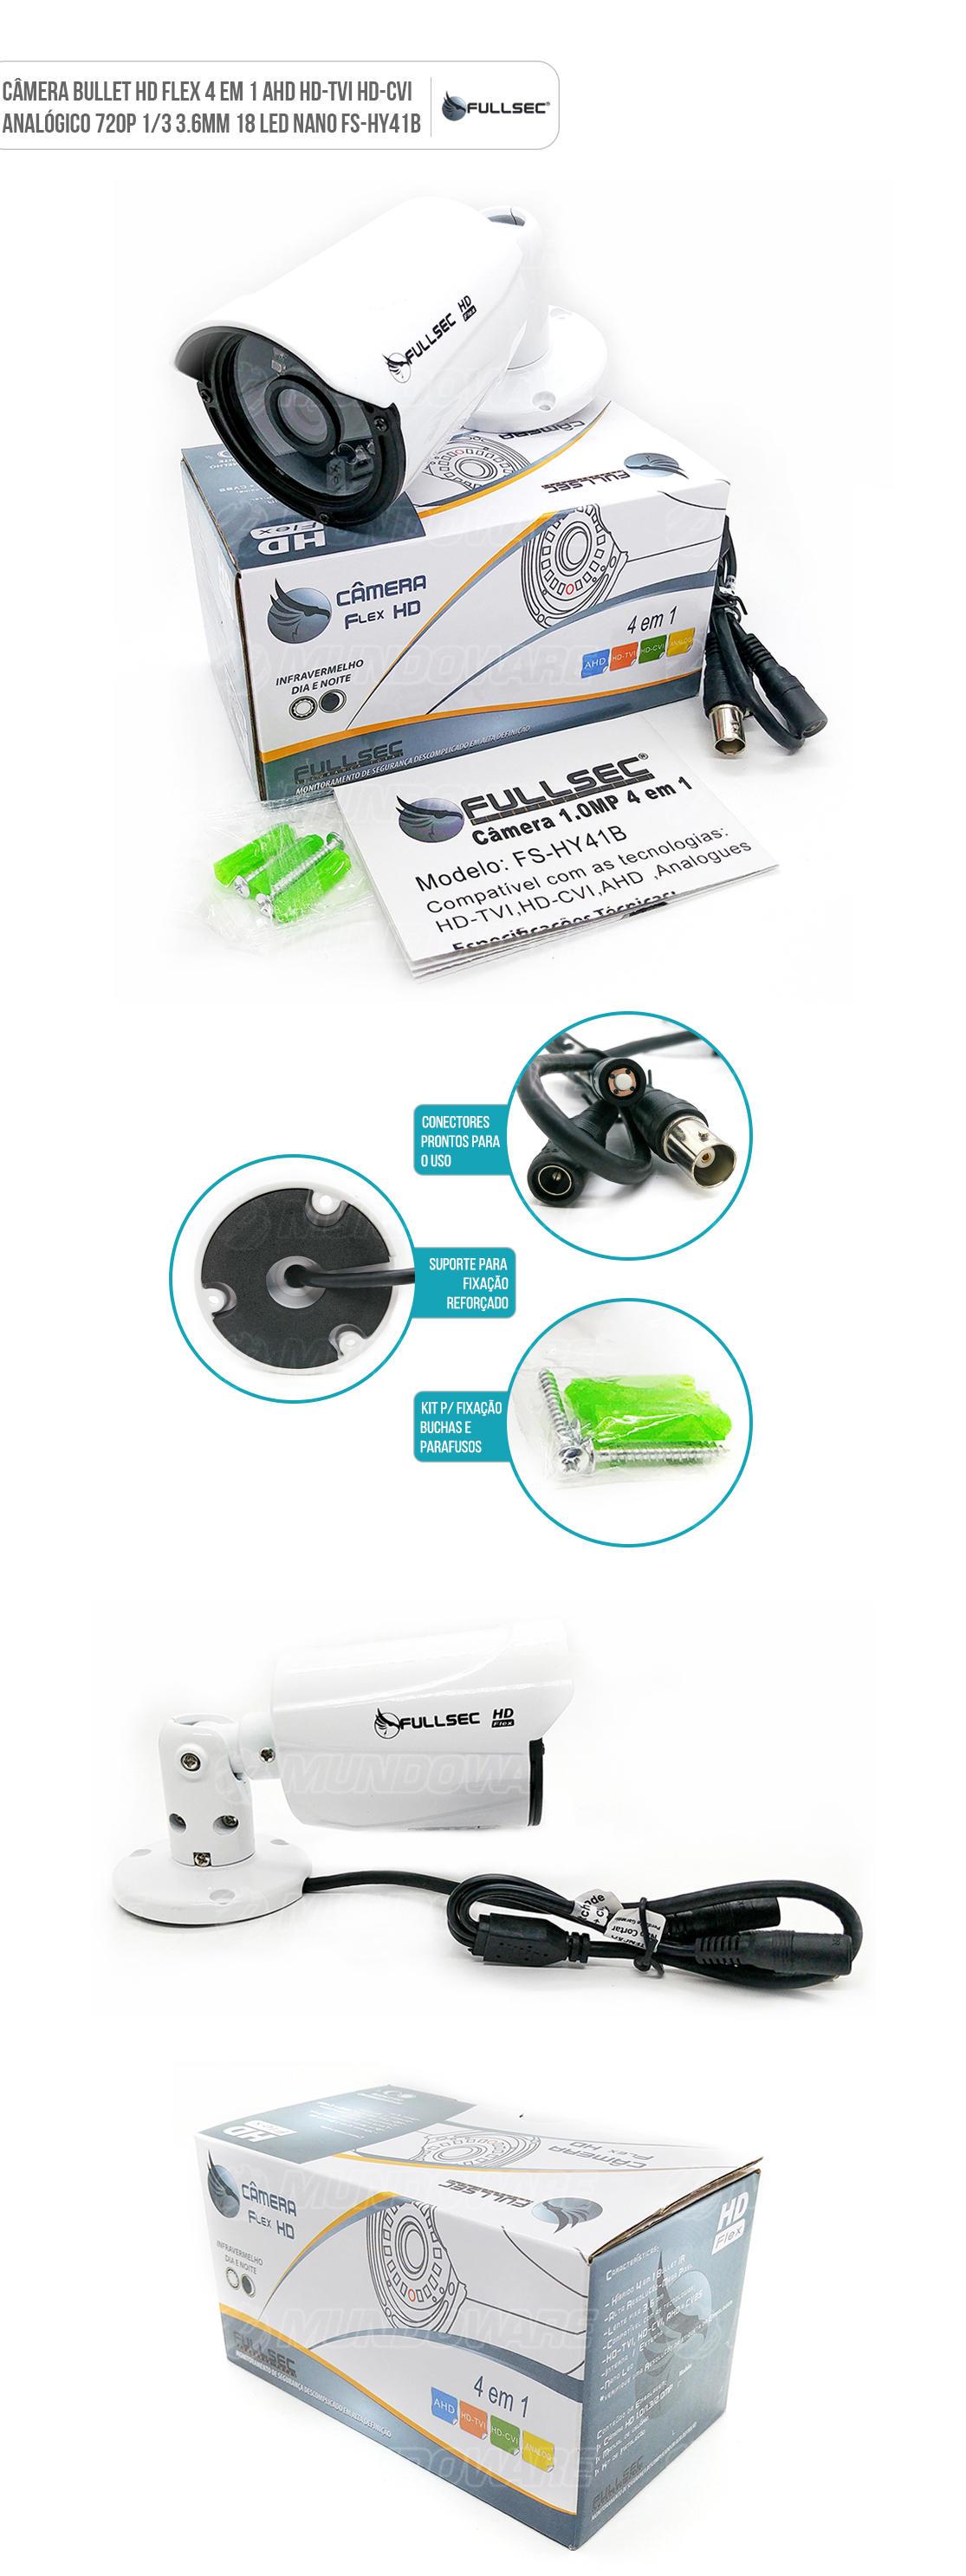 Camêra de Segurança Bullet HD Flex 4x1 AHD HD-TVI HD-CVI Analógica 720p